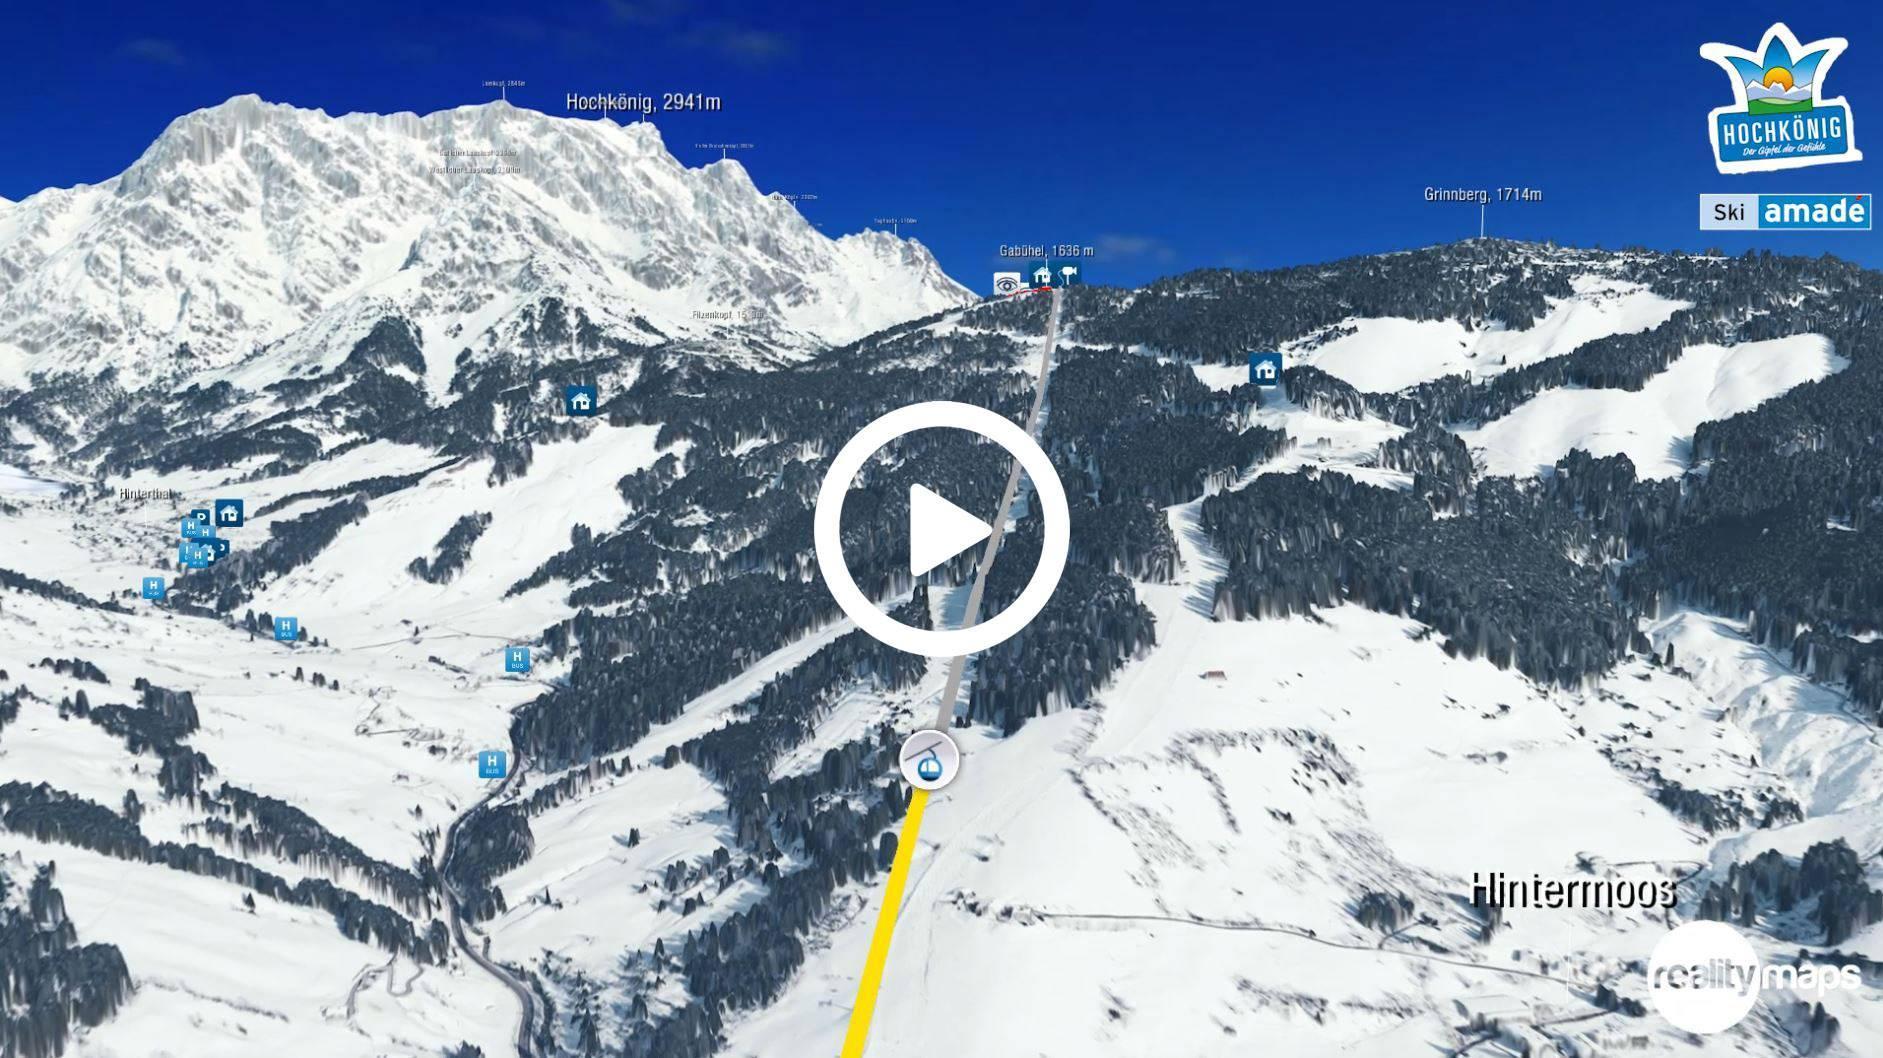 3D Animation Ski amadé Königstour